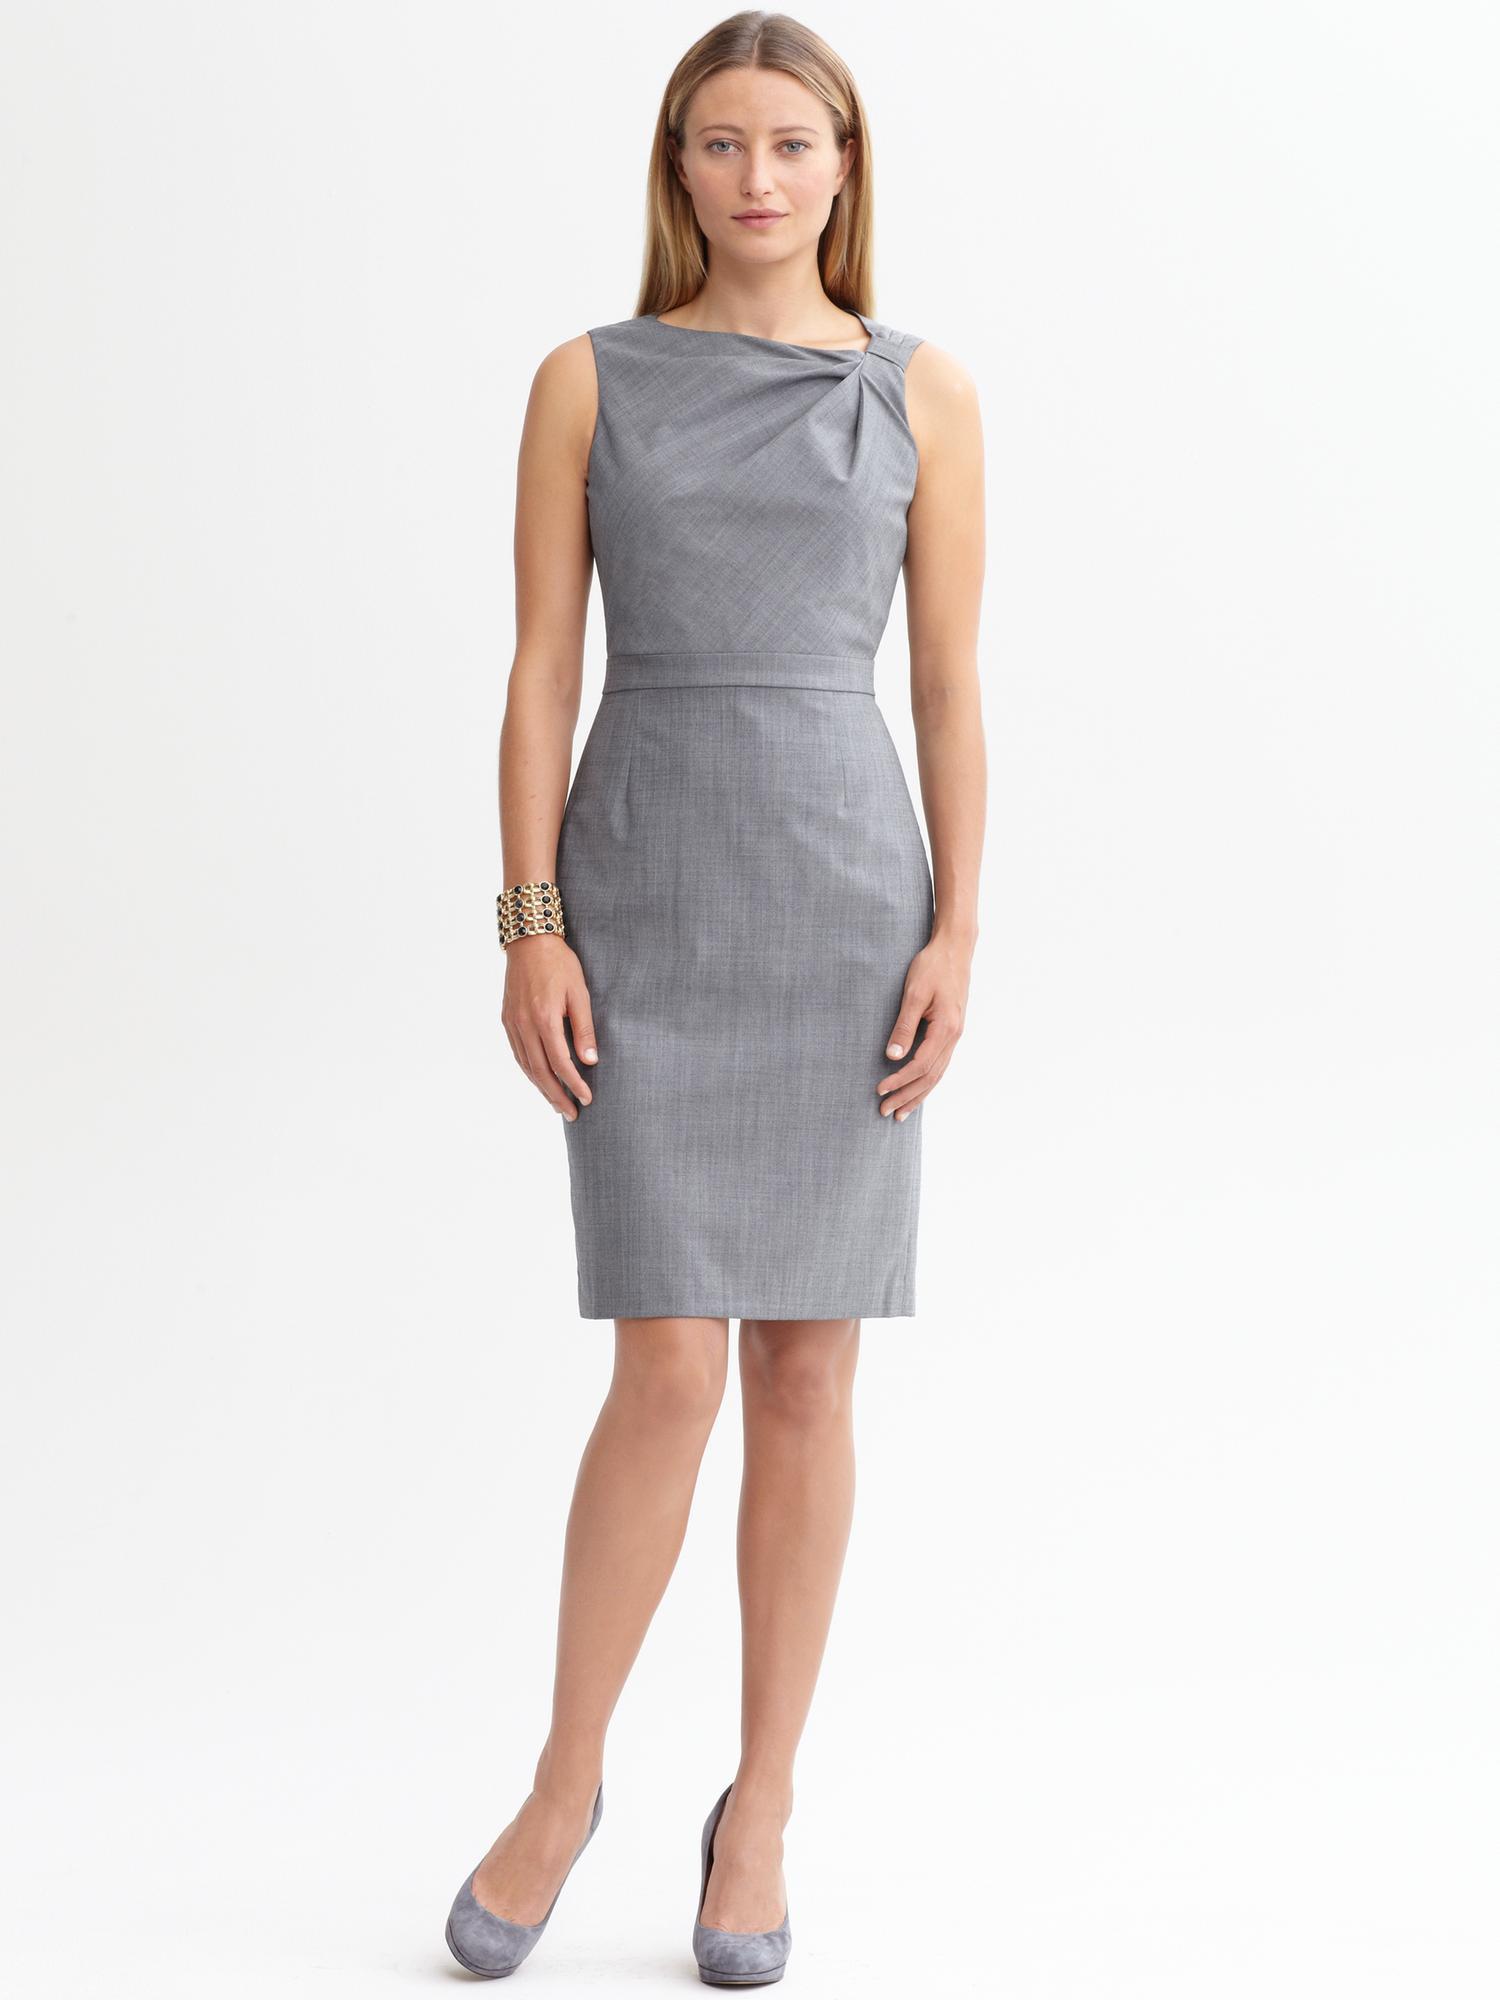 Banana Republic Evelyn Light Weight Wool Dress In Grey